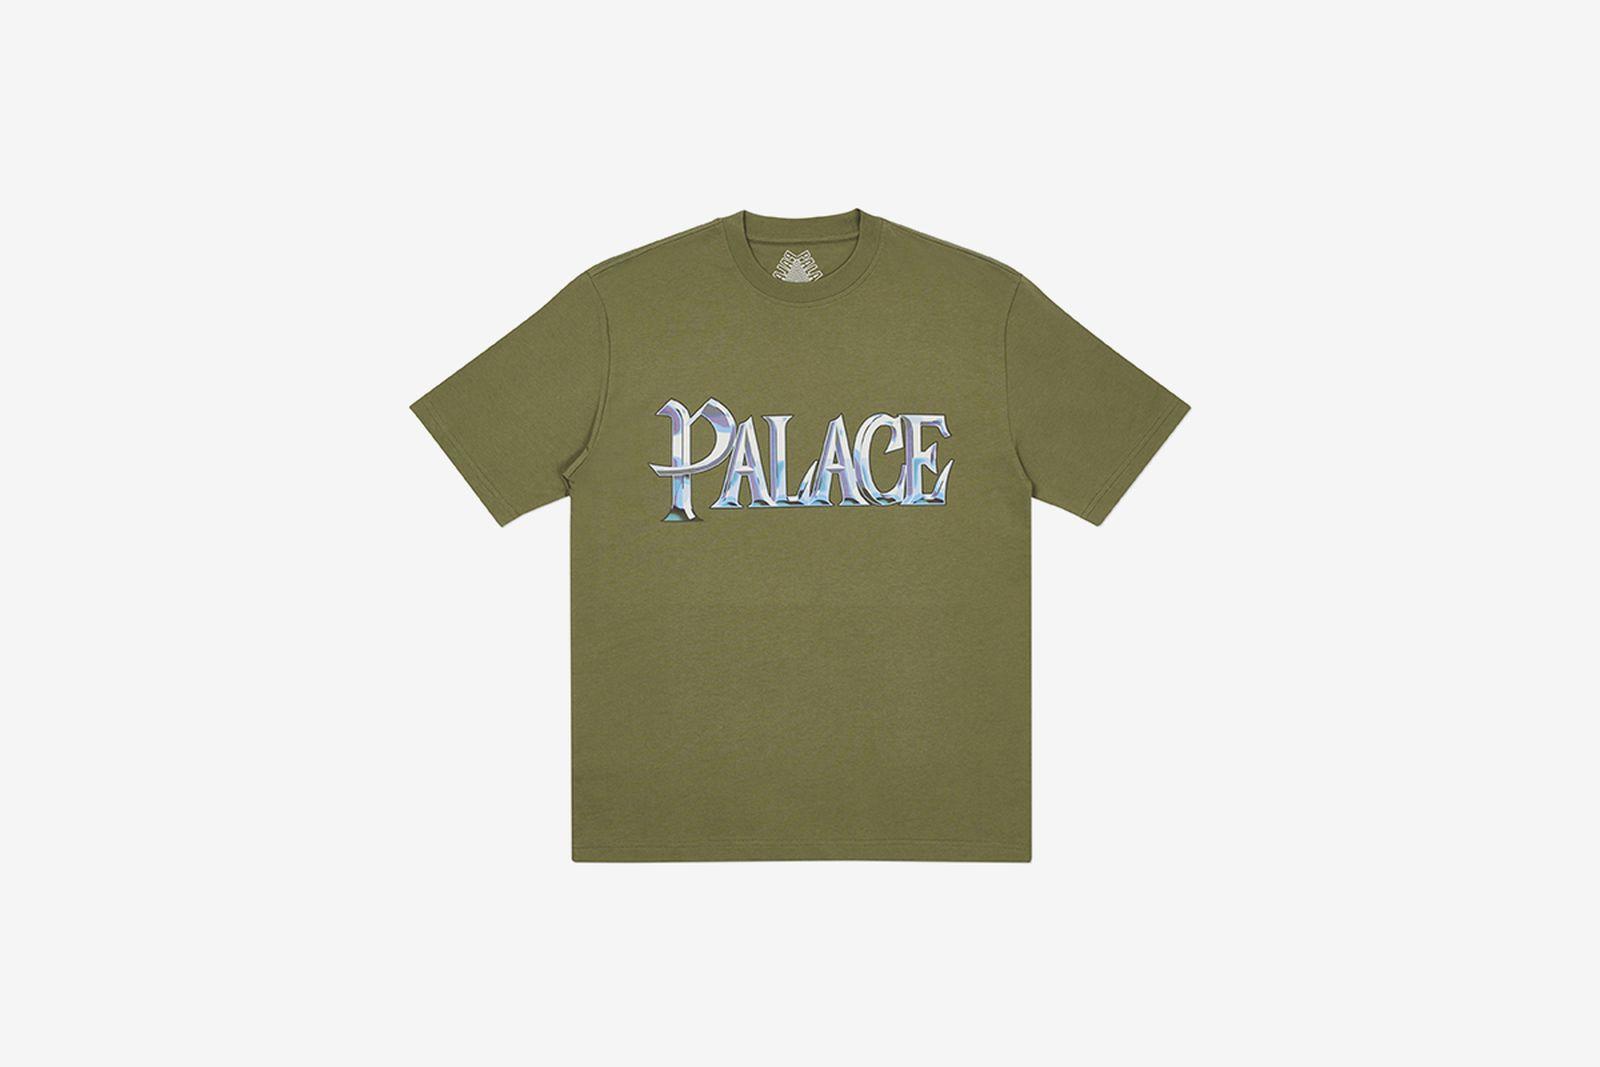 palace-winter-6-drop-new-era-1-16